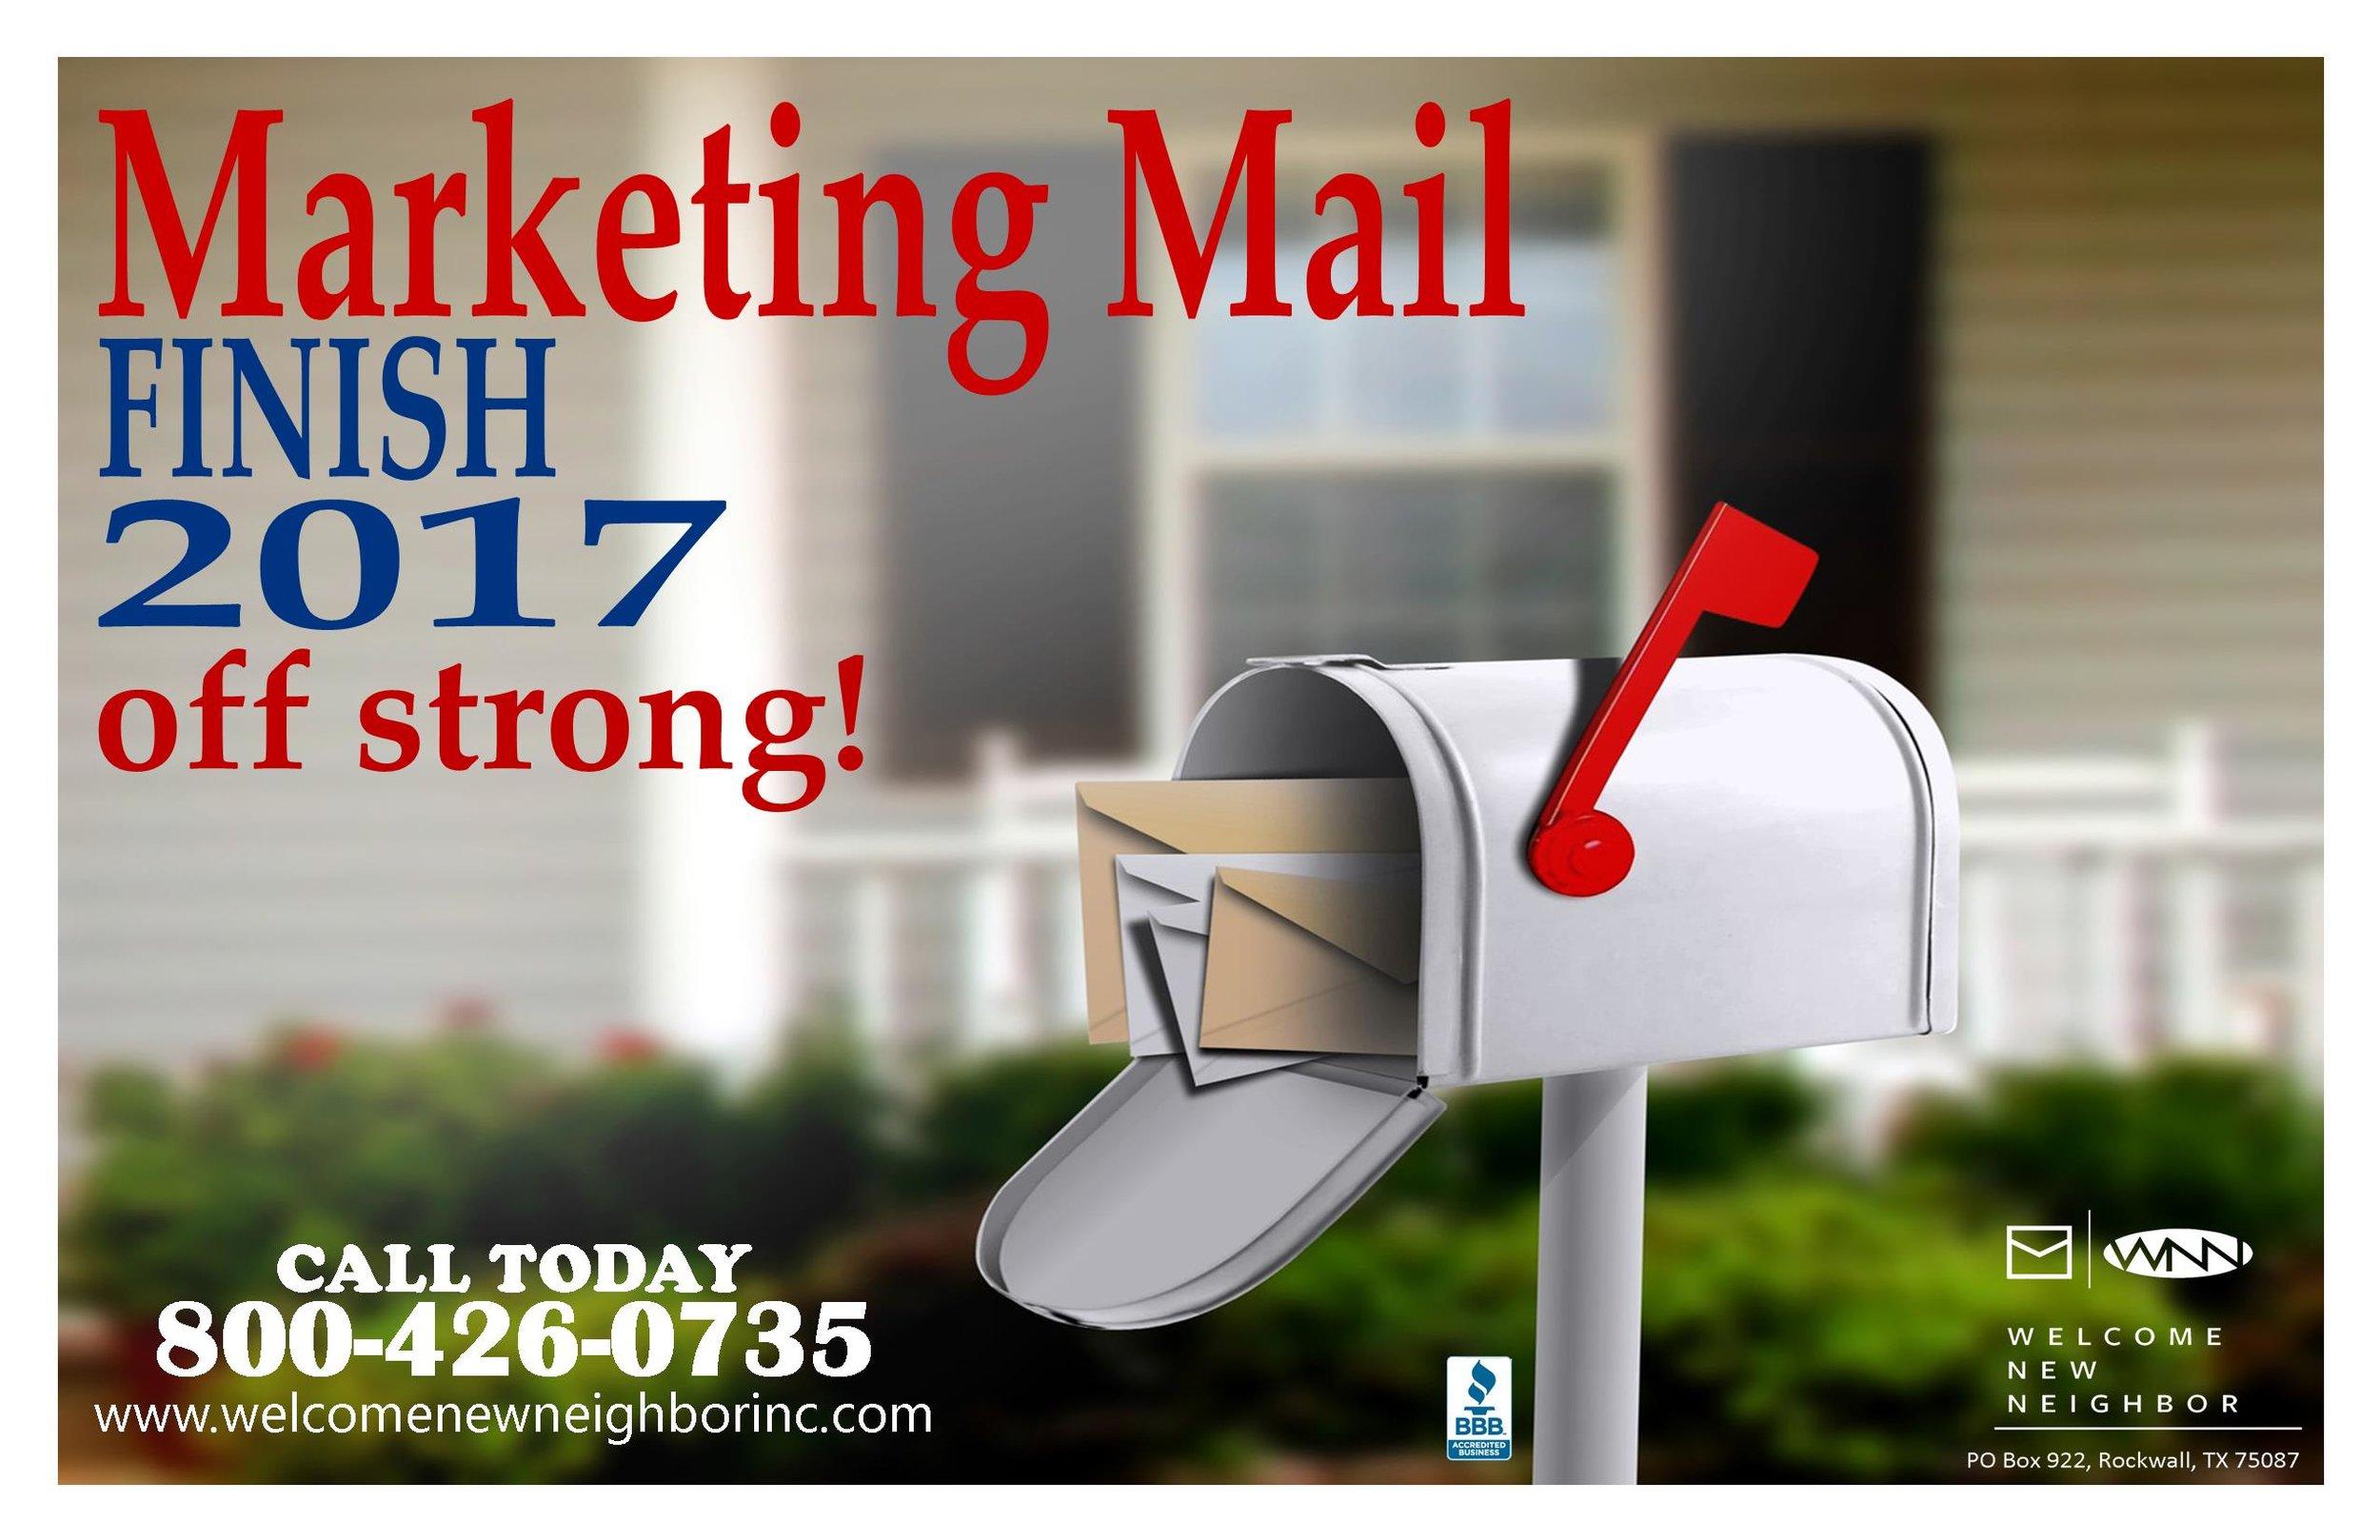 Marketing Mail